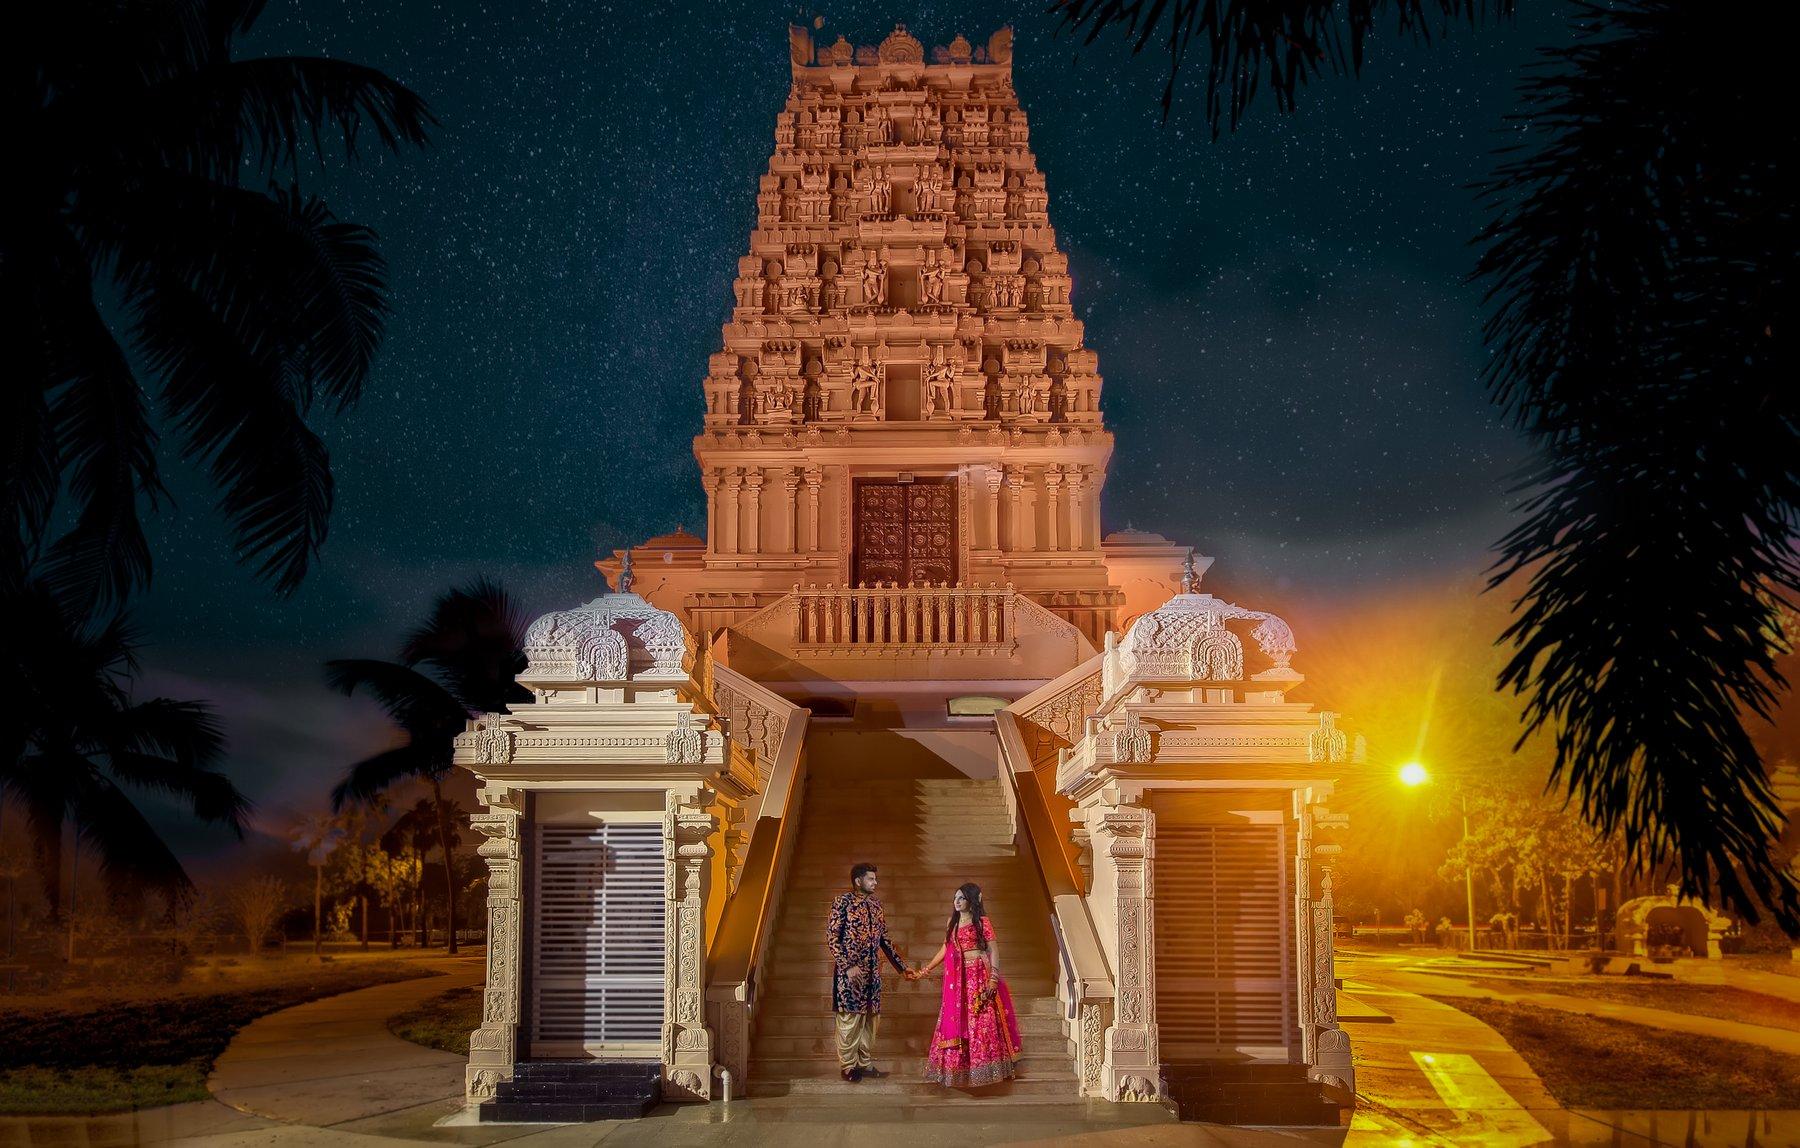 The Hindu Temple of Florida, Miami Wedding Photographers | Häring Photography, Indian Wedding Photographer in Florida, Best Muslim, Hindu - South East Asian Wedding Photographers